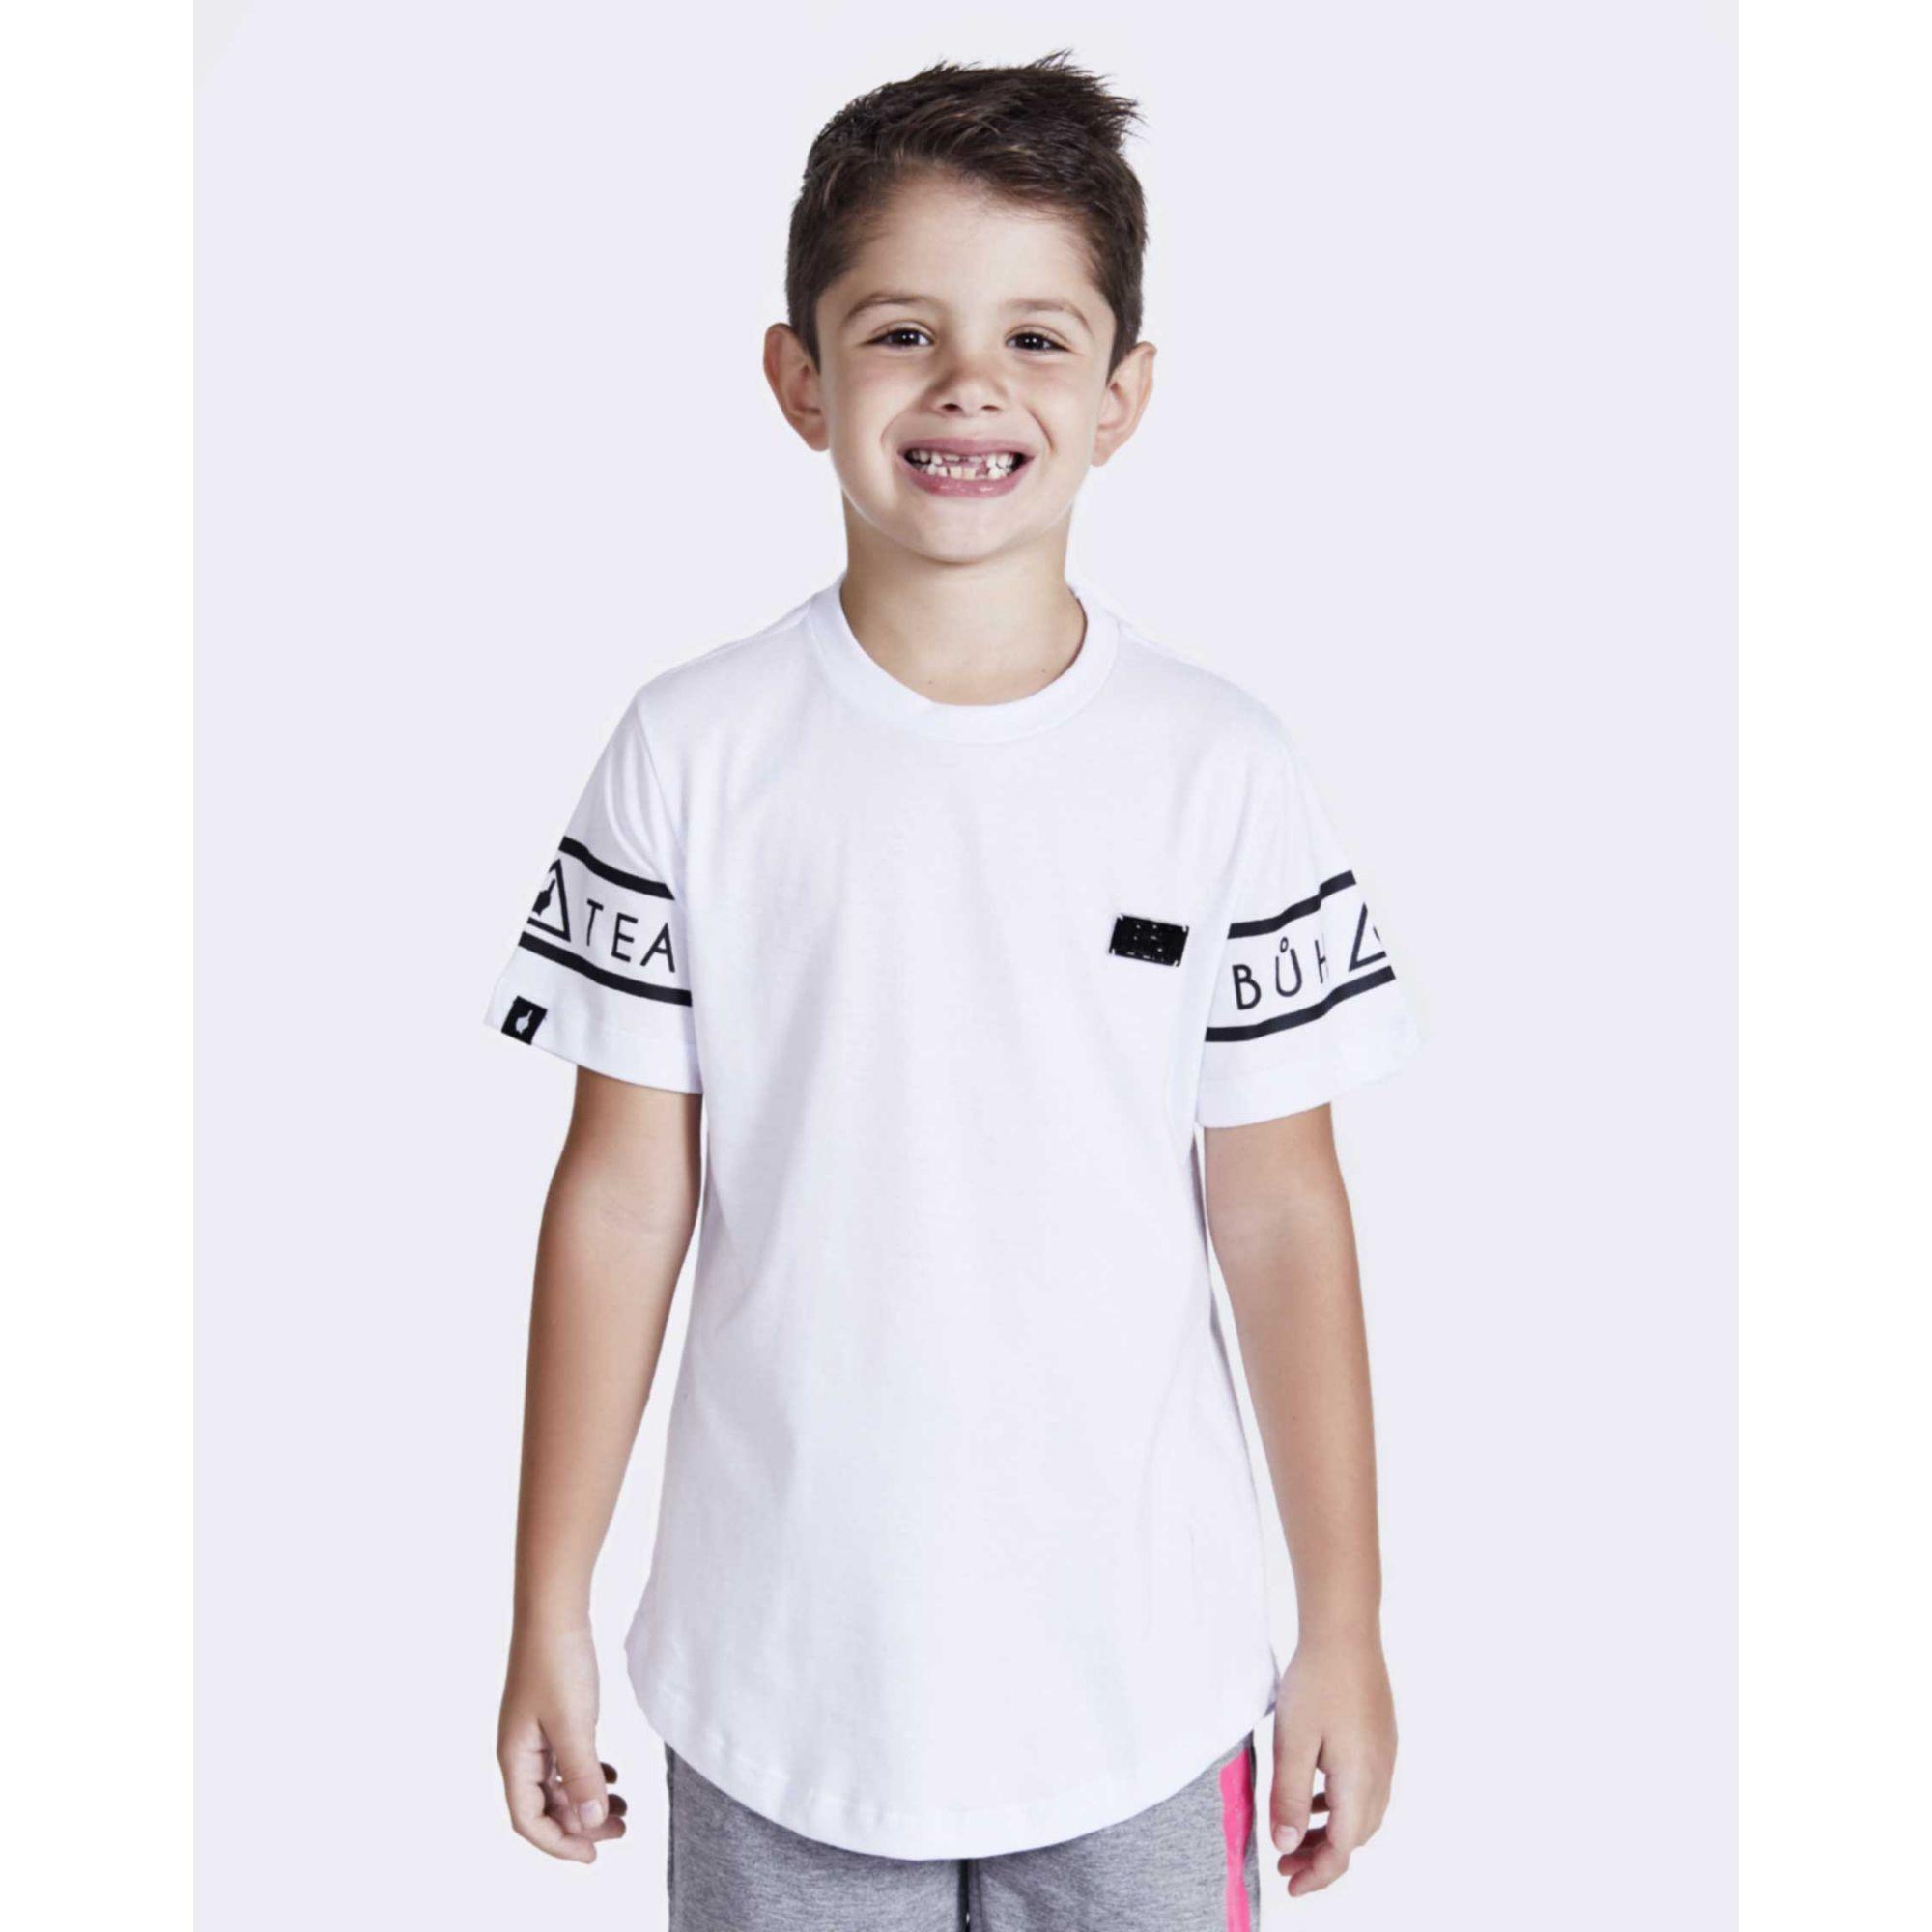 Camiseta Buh Kids Sleeve White